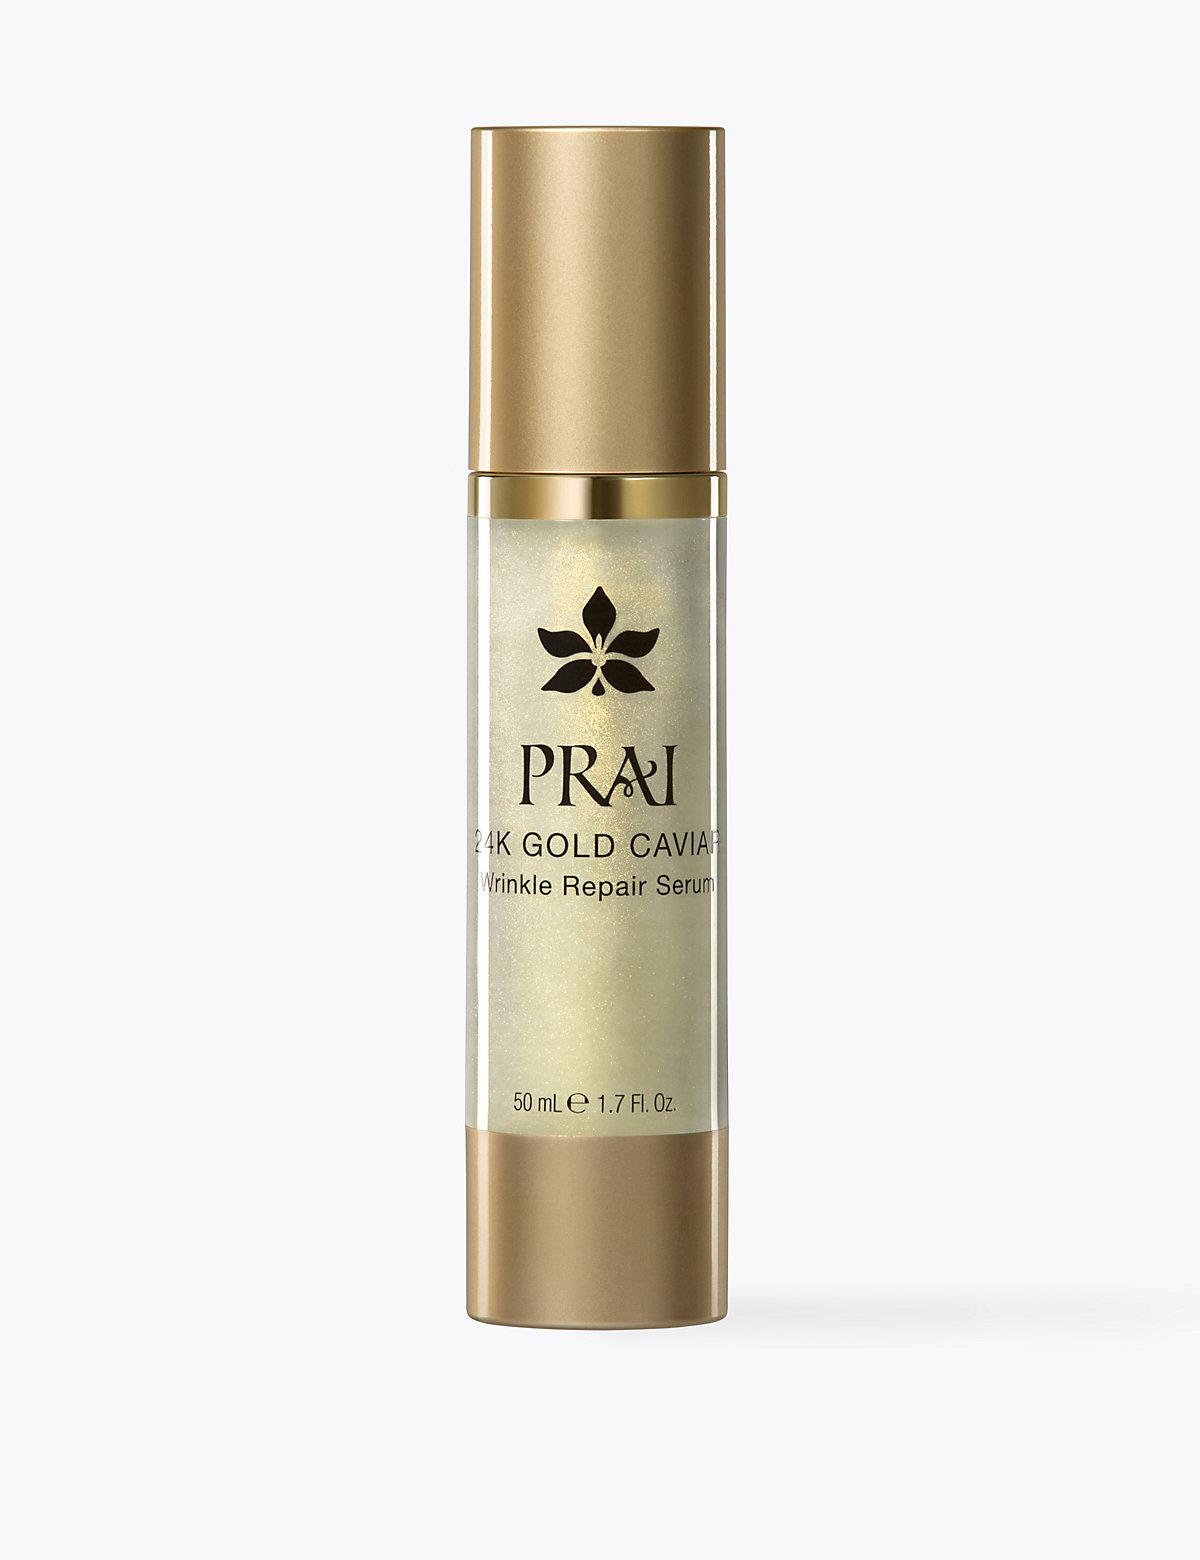 PRAI 24K Gold Wrinkle Repair Serum 50ml